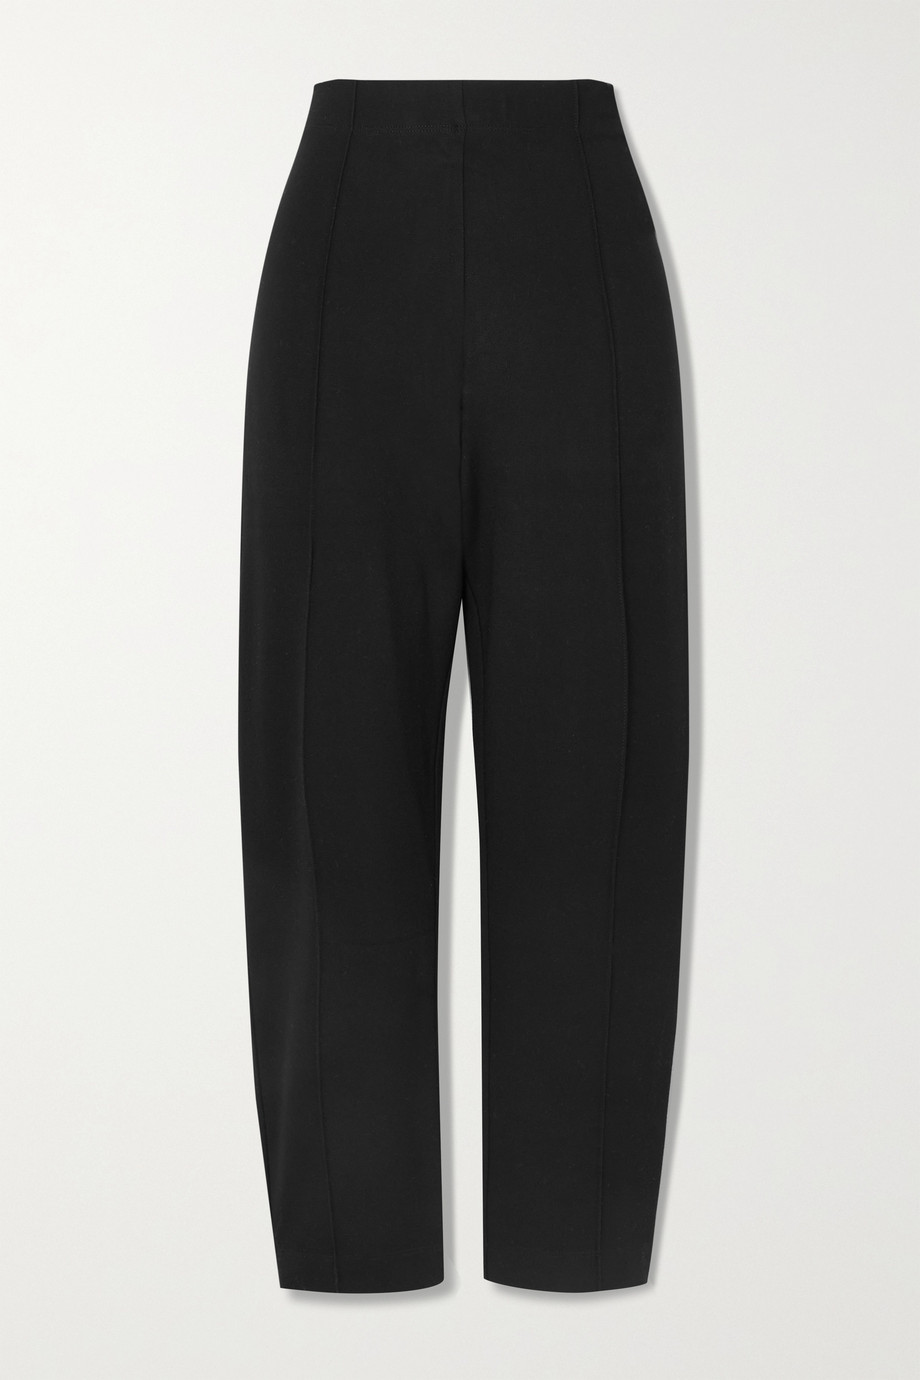 LESET Rio cropped straight-leg stretch-ponte pants